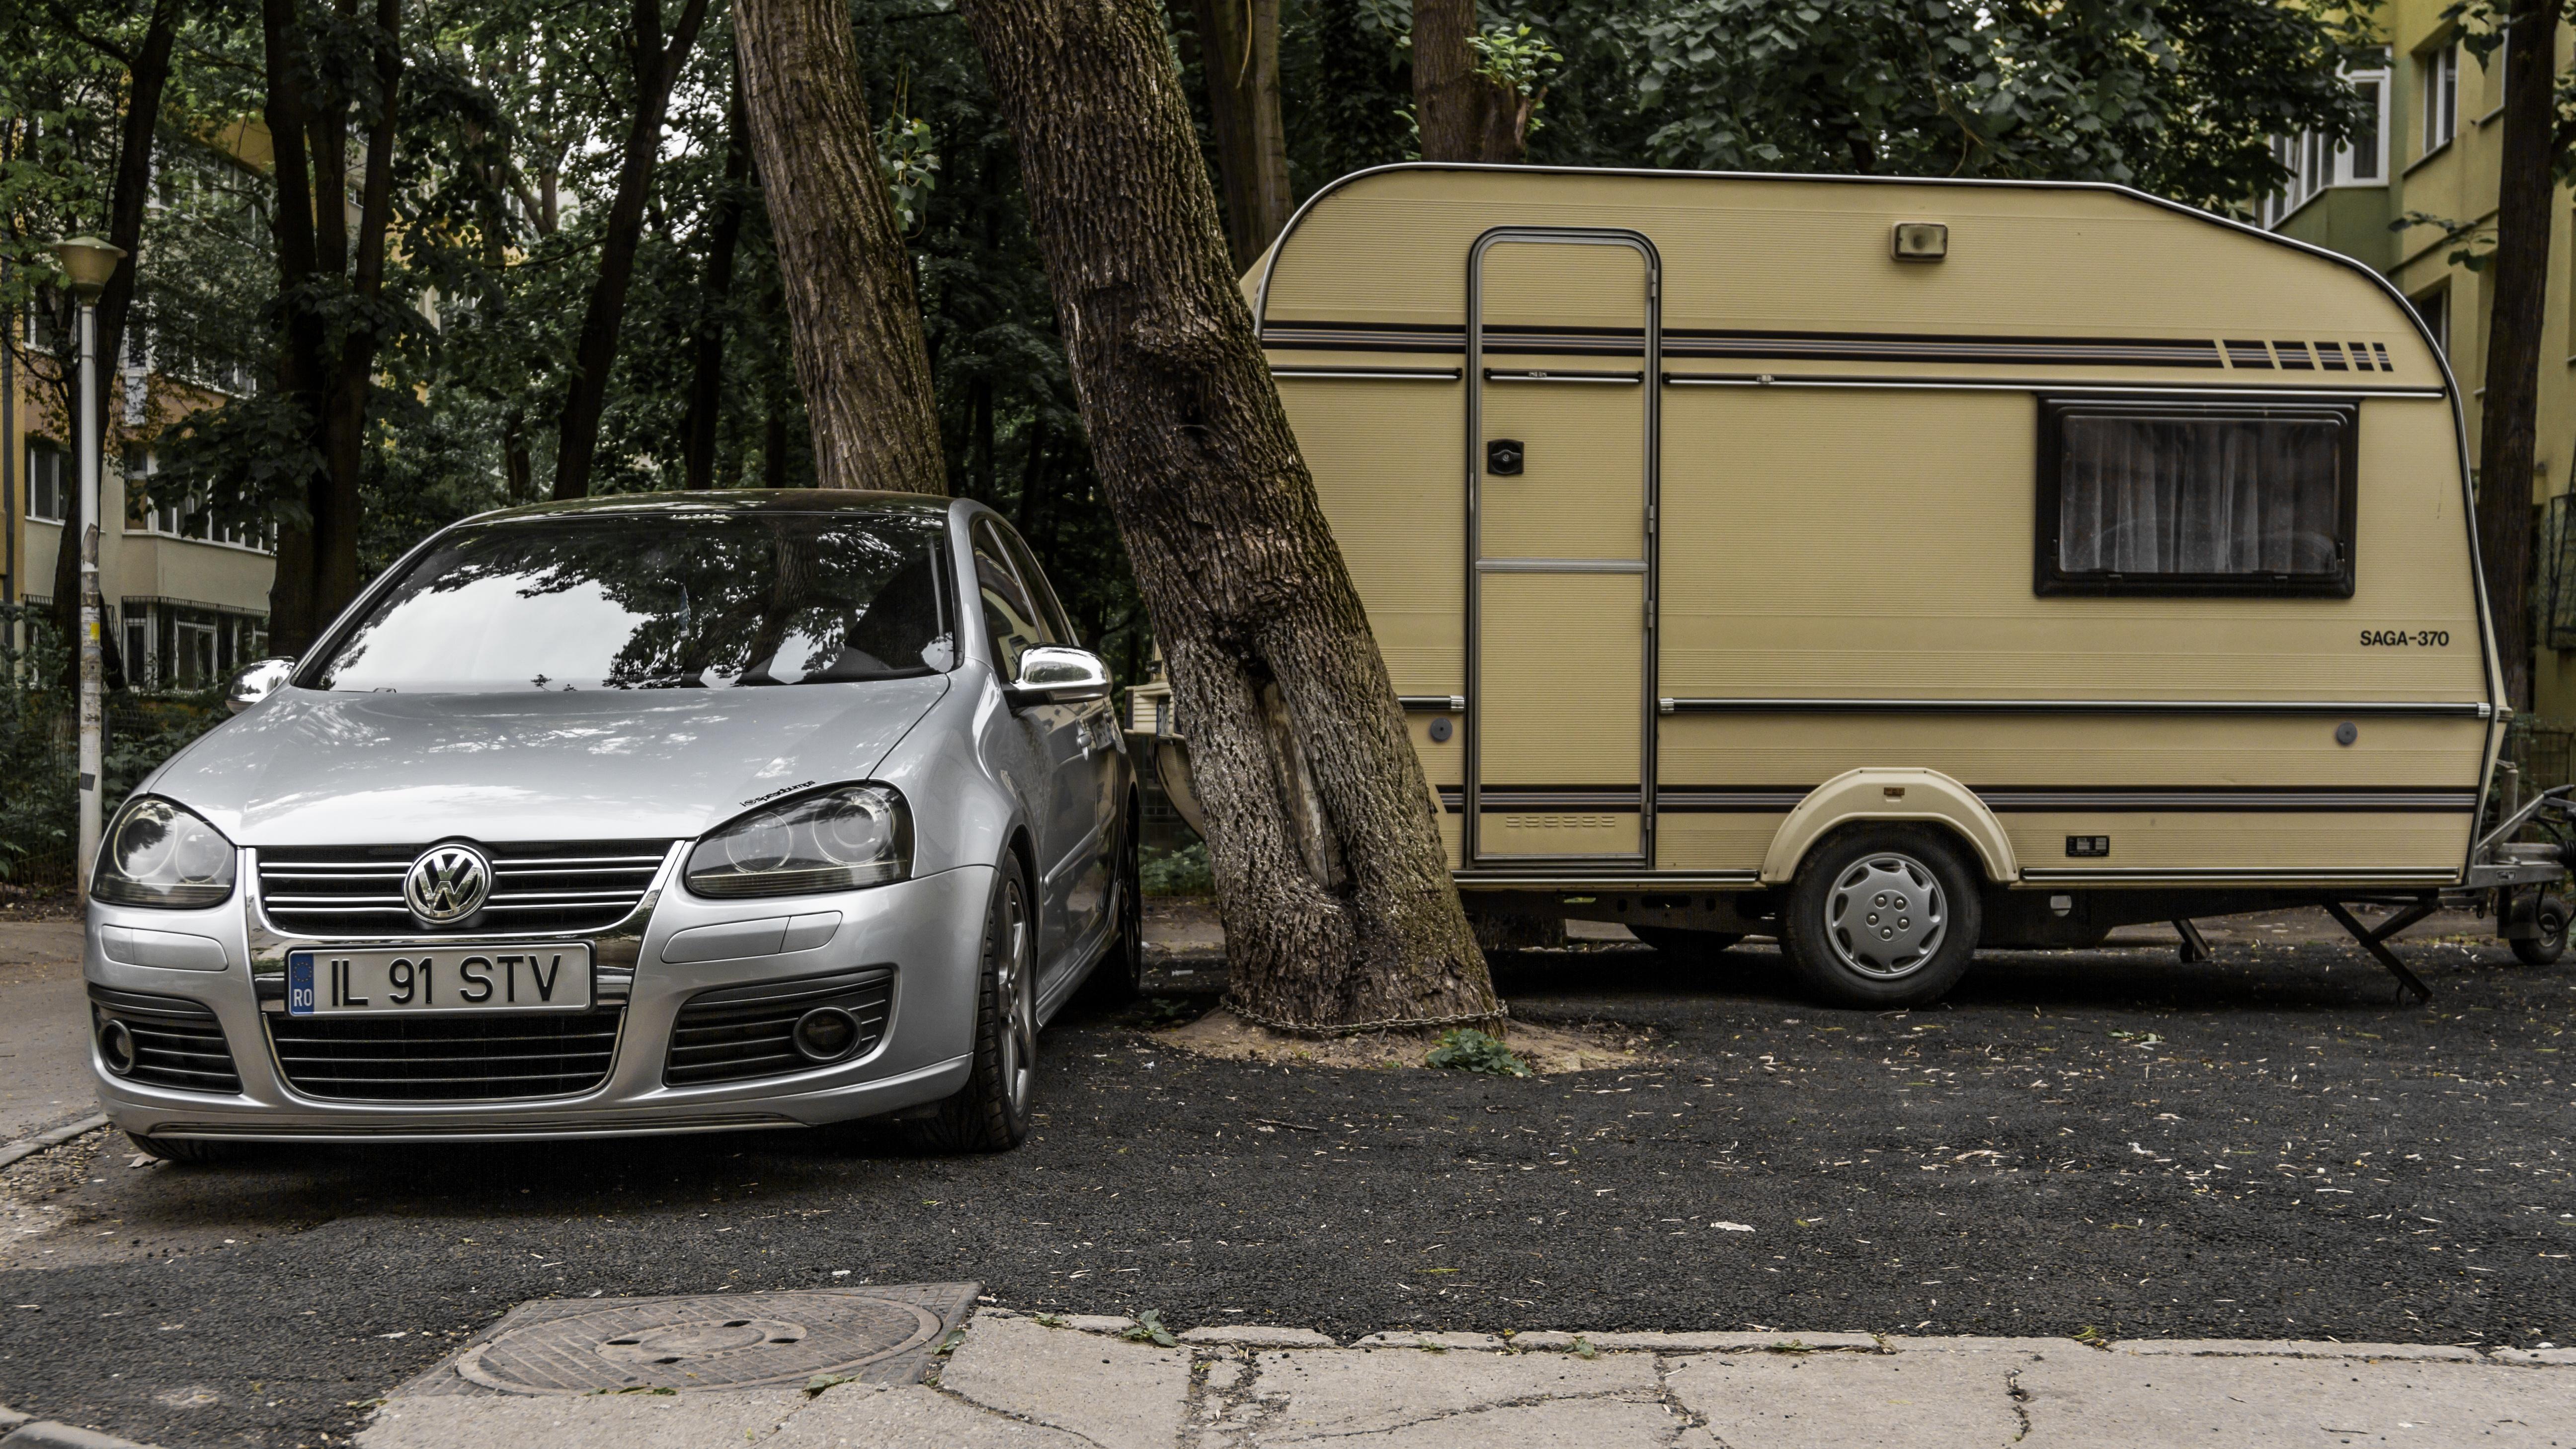 Free Images : wheel, bumper, sedan, city car, land vehicle ...